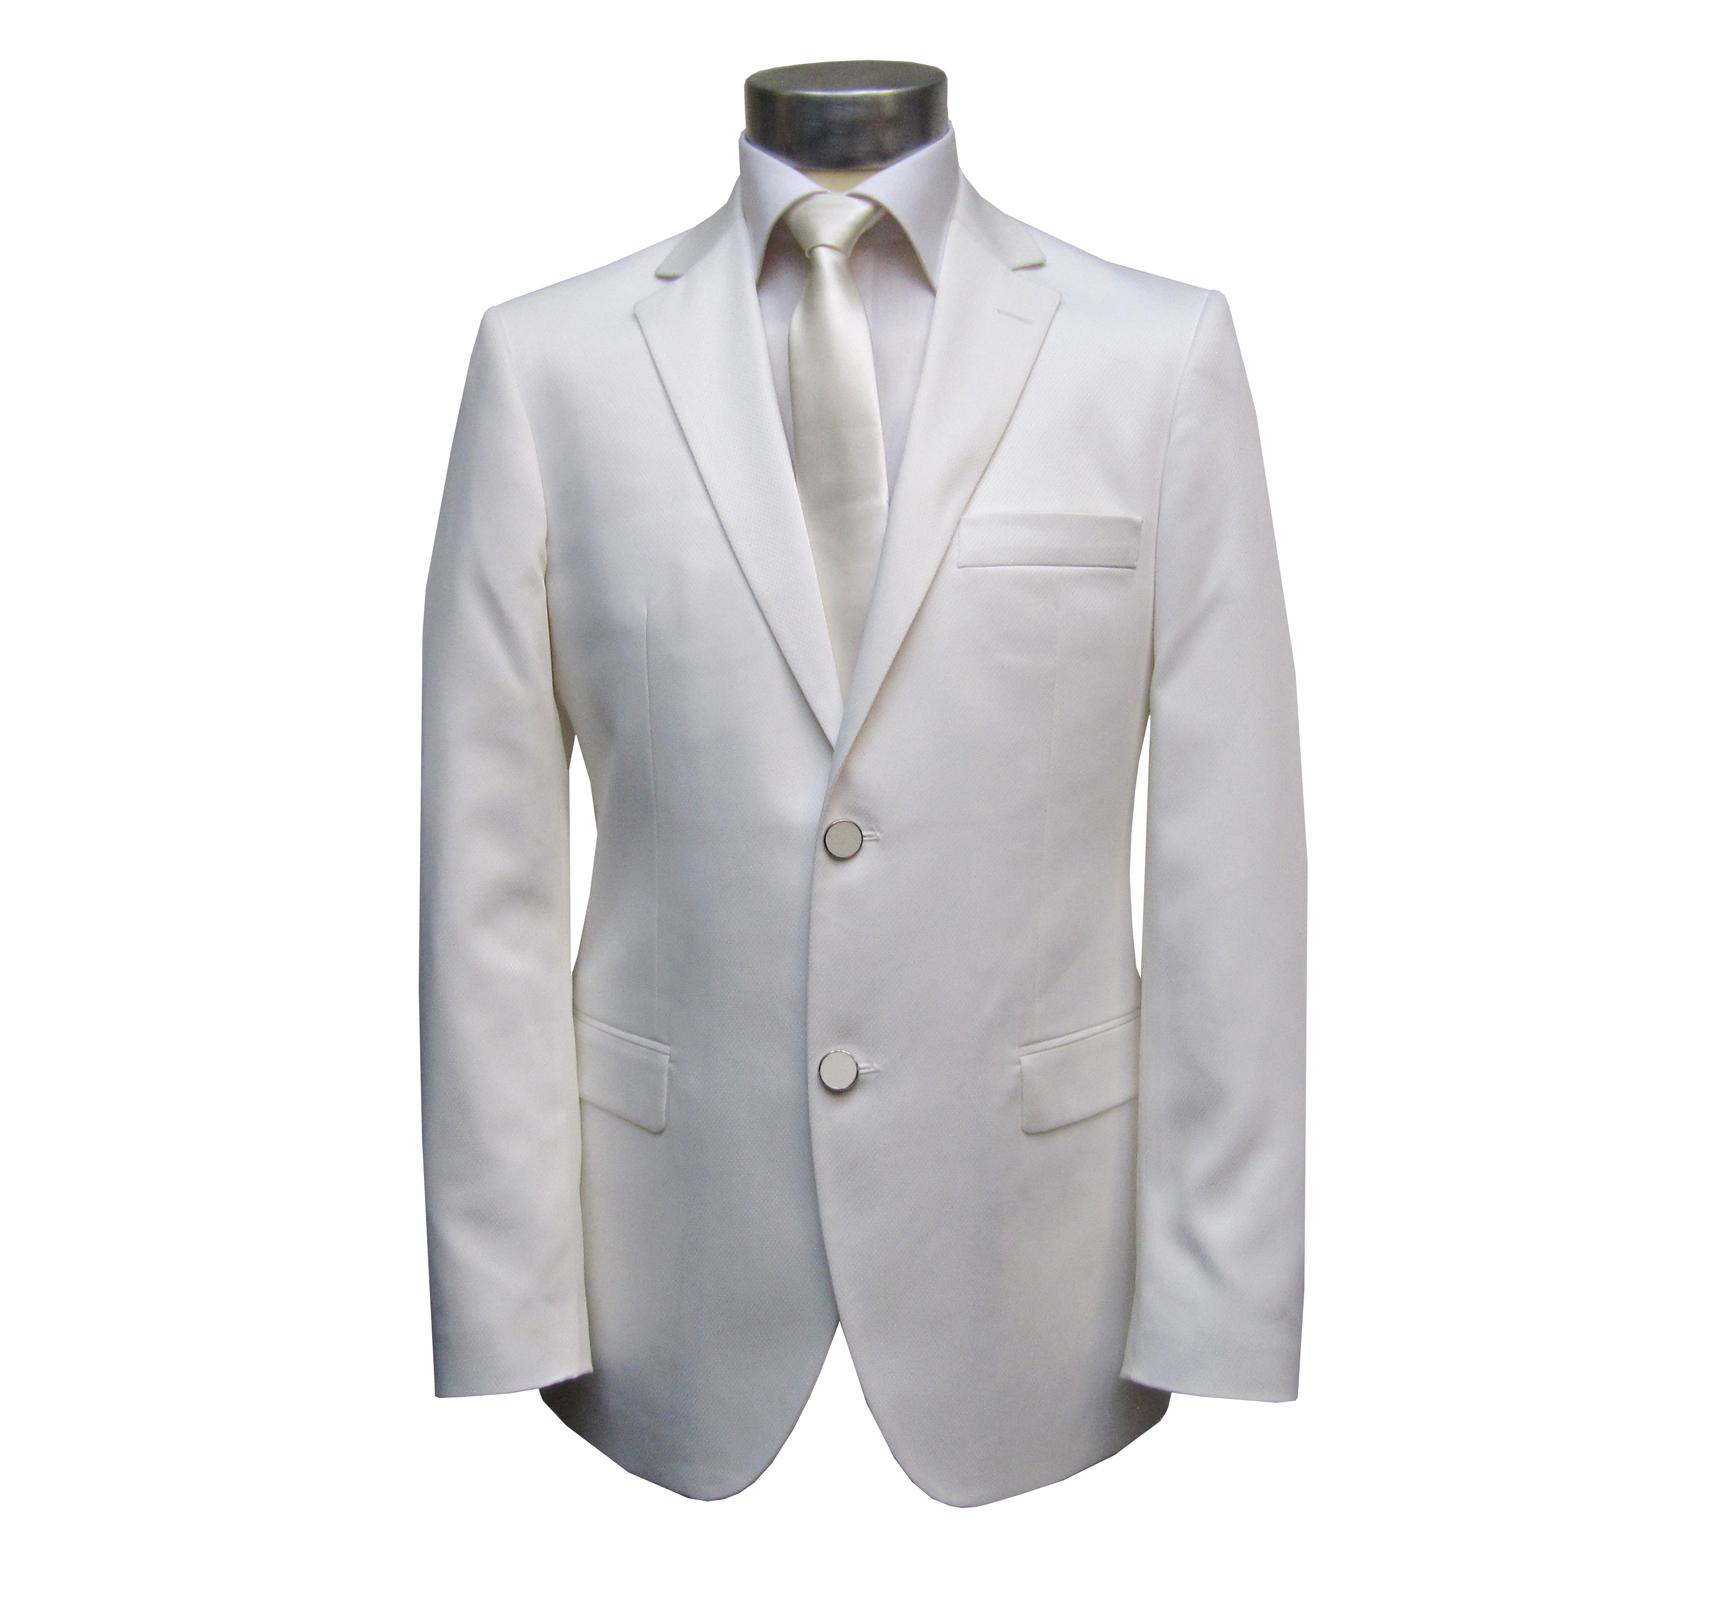 Costumes modèle de diamant de mariage Muga - Costume Mmuga 8d091540a63